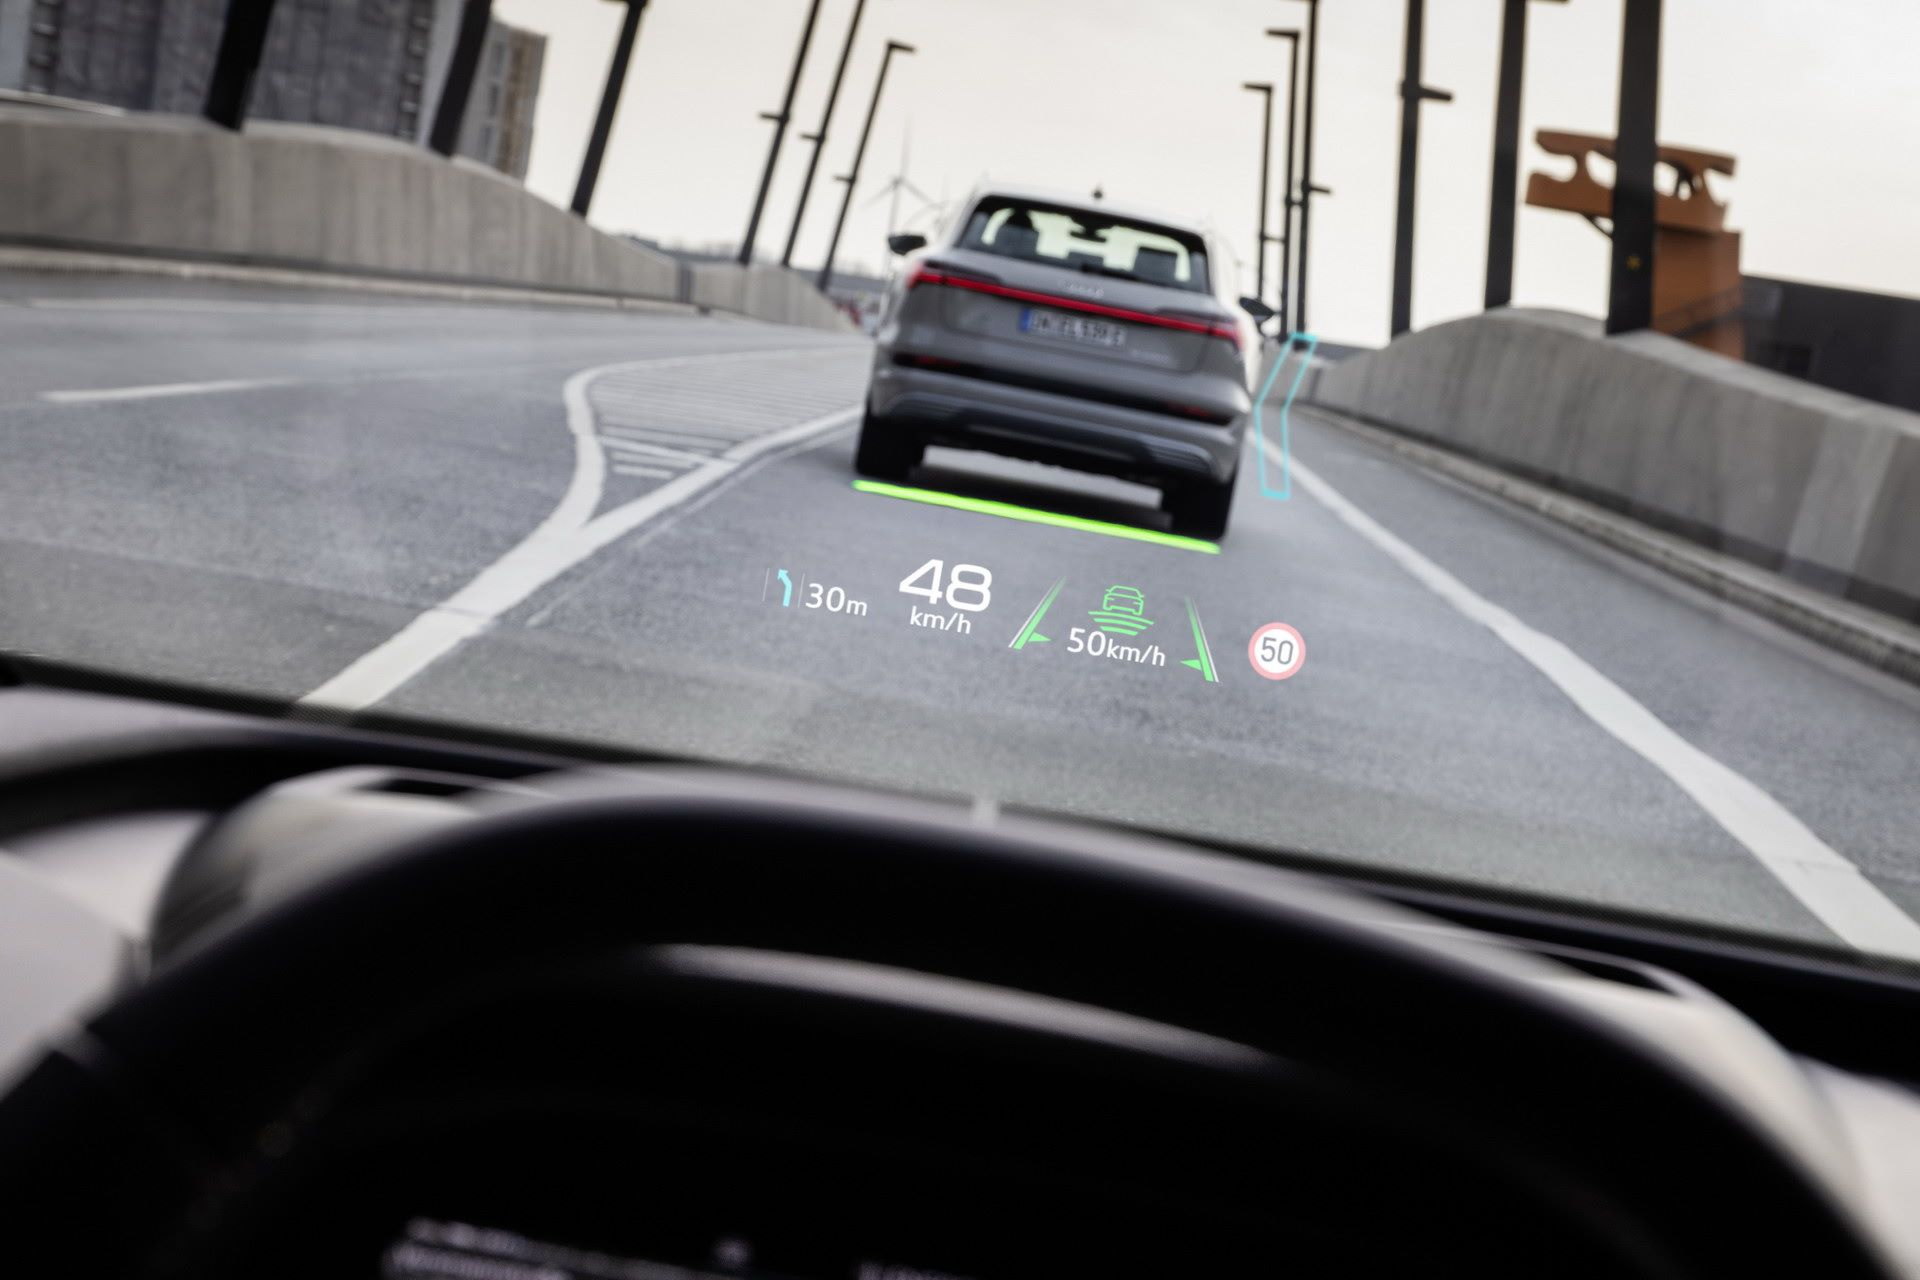 Audi-Q4-e-tron-and-Q4-e-tron-Sportback-60